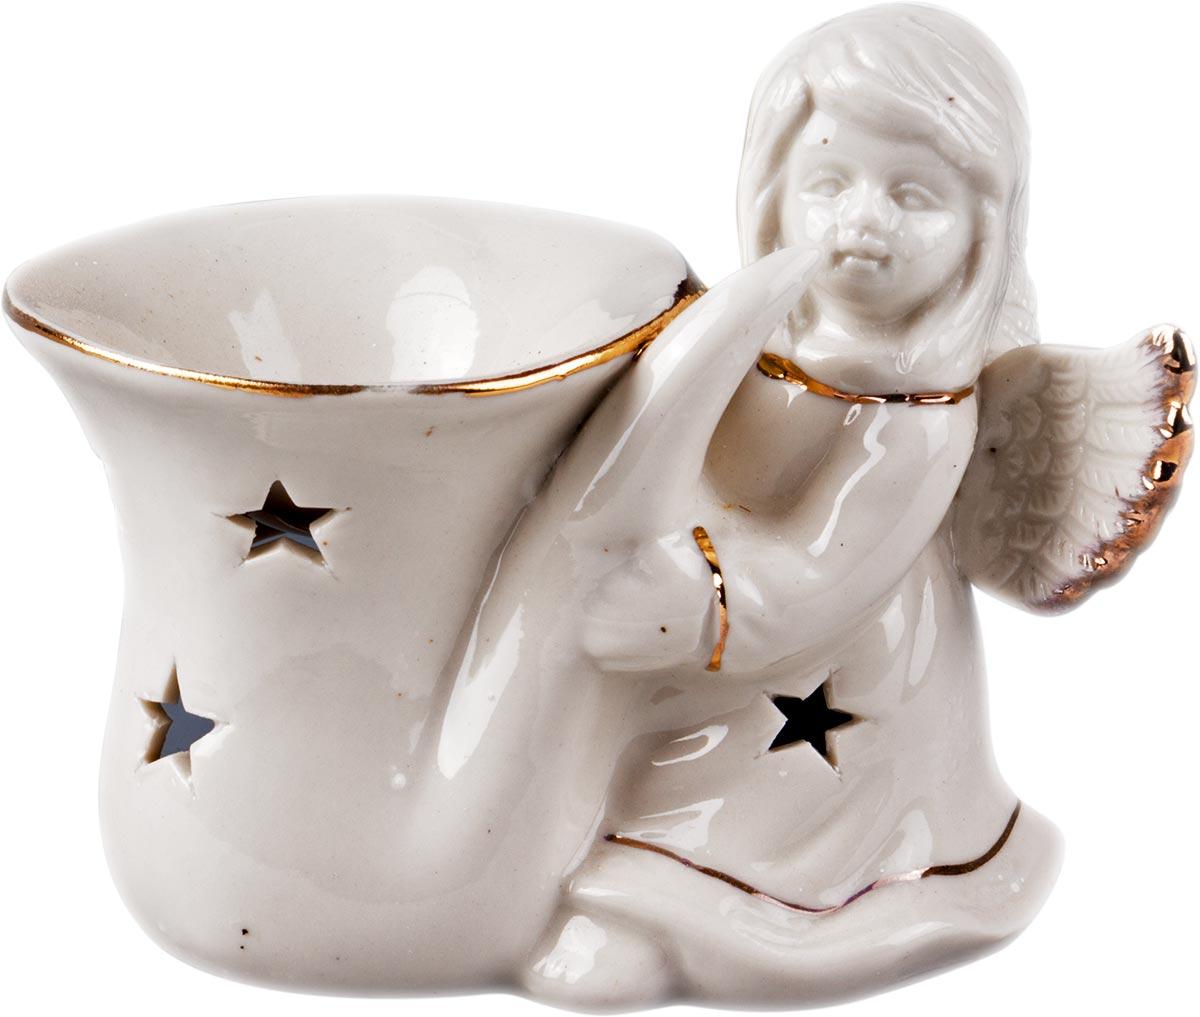 Аромалампа Ангел, цвет: белый, 10 х 10 см аромалампа шар